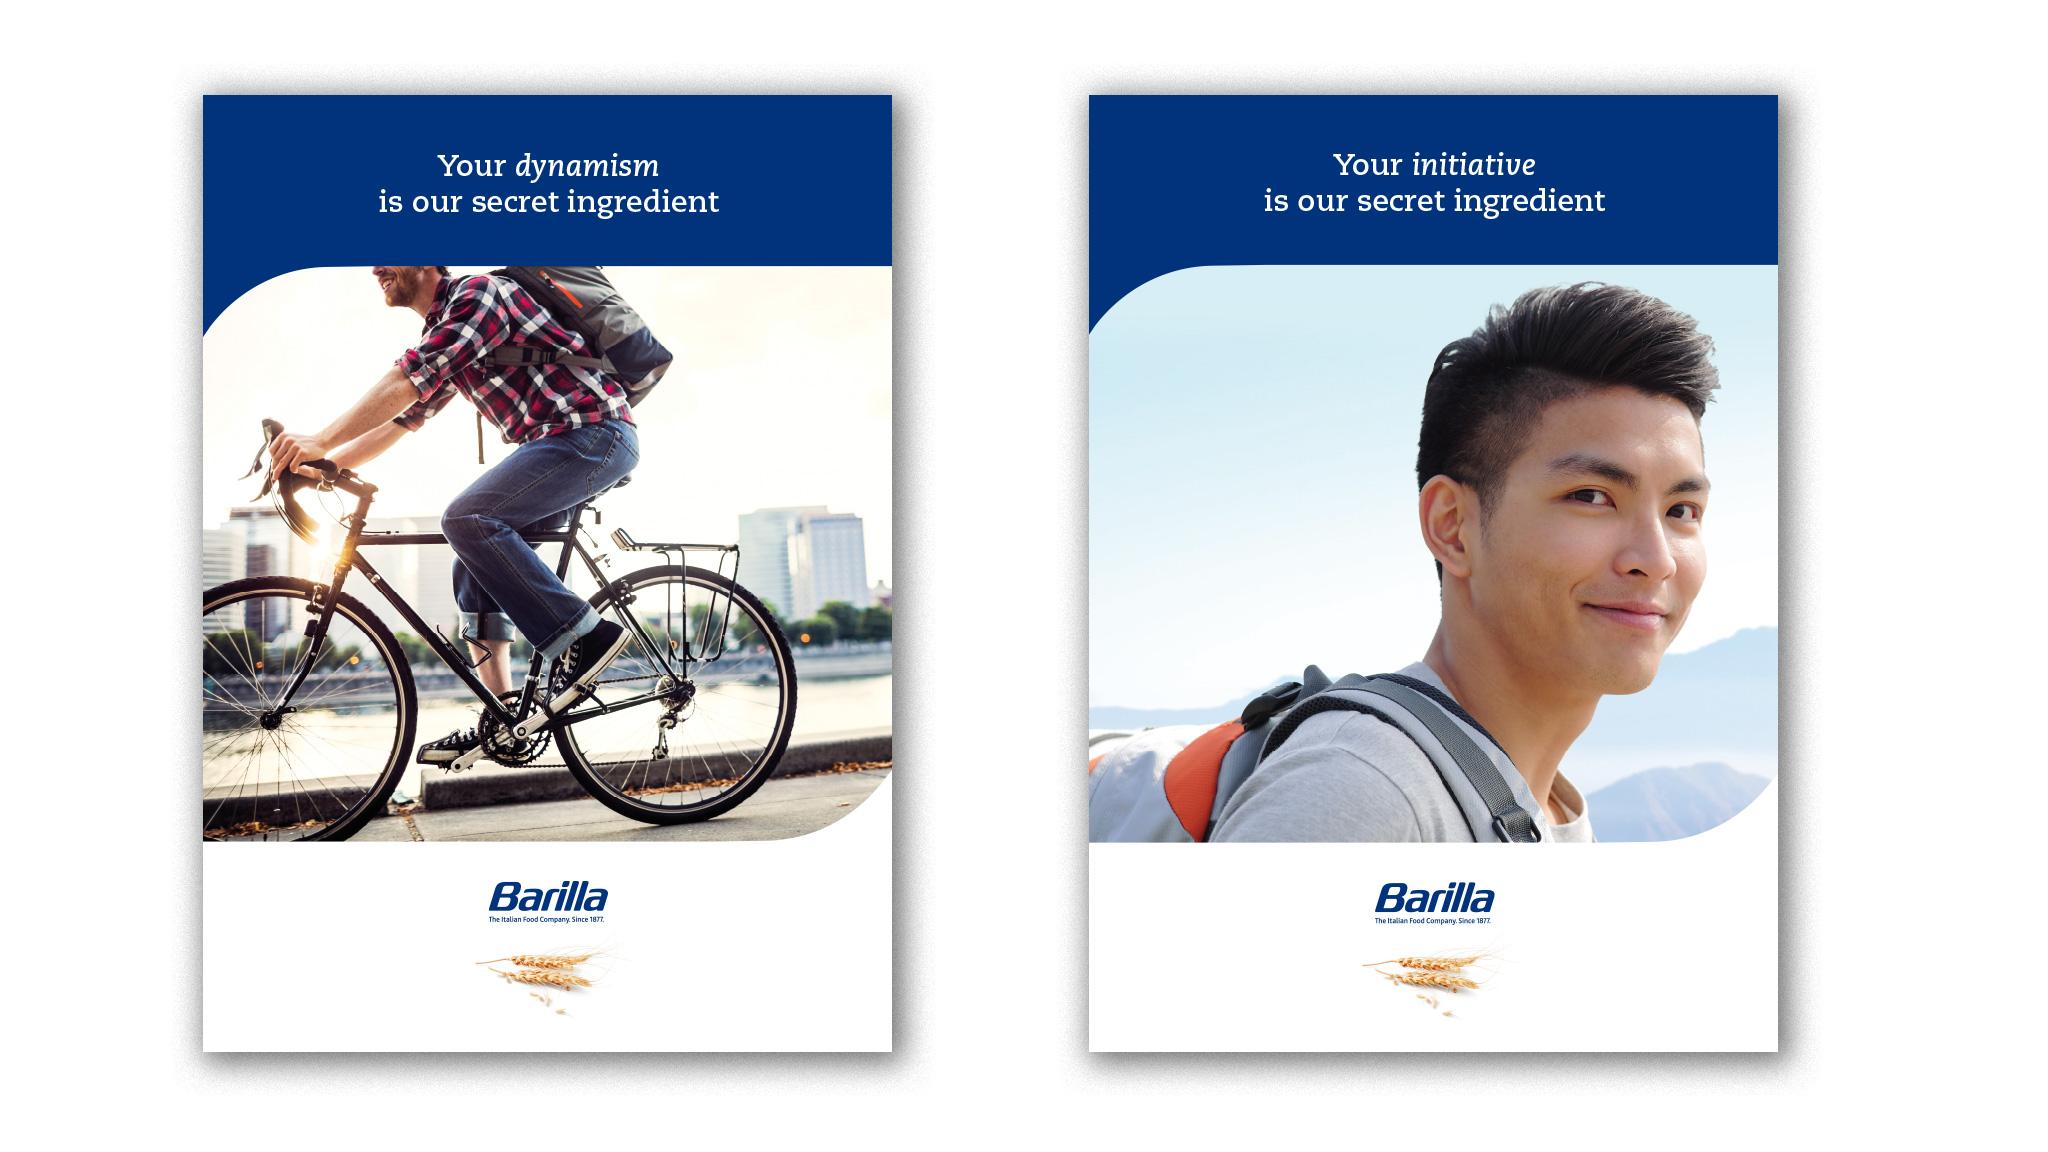 barilla-employer-branding-industree-08